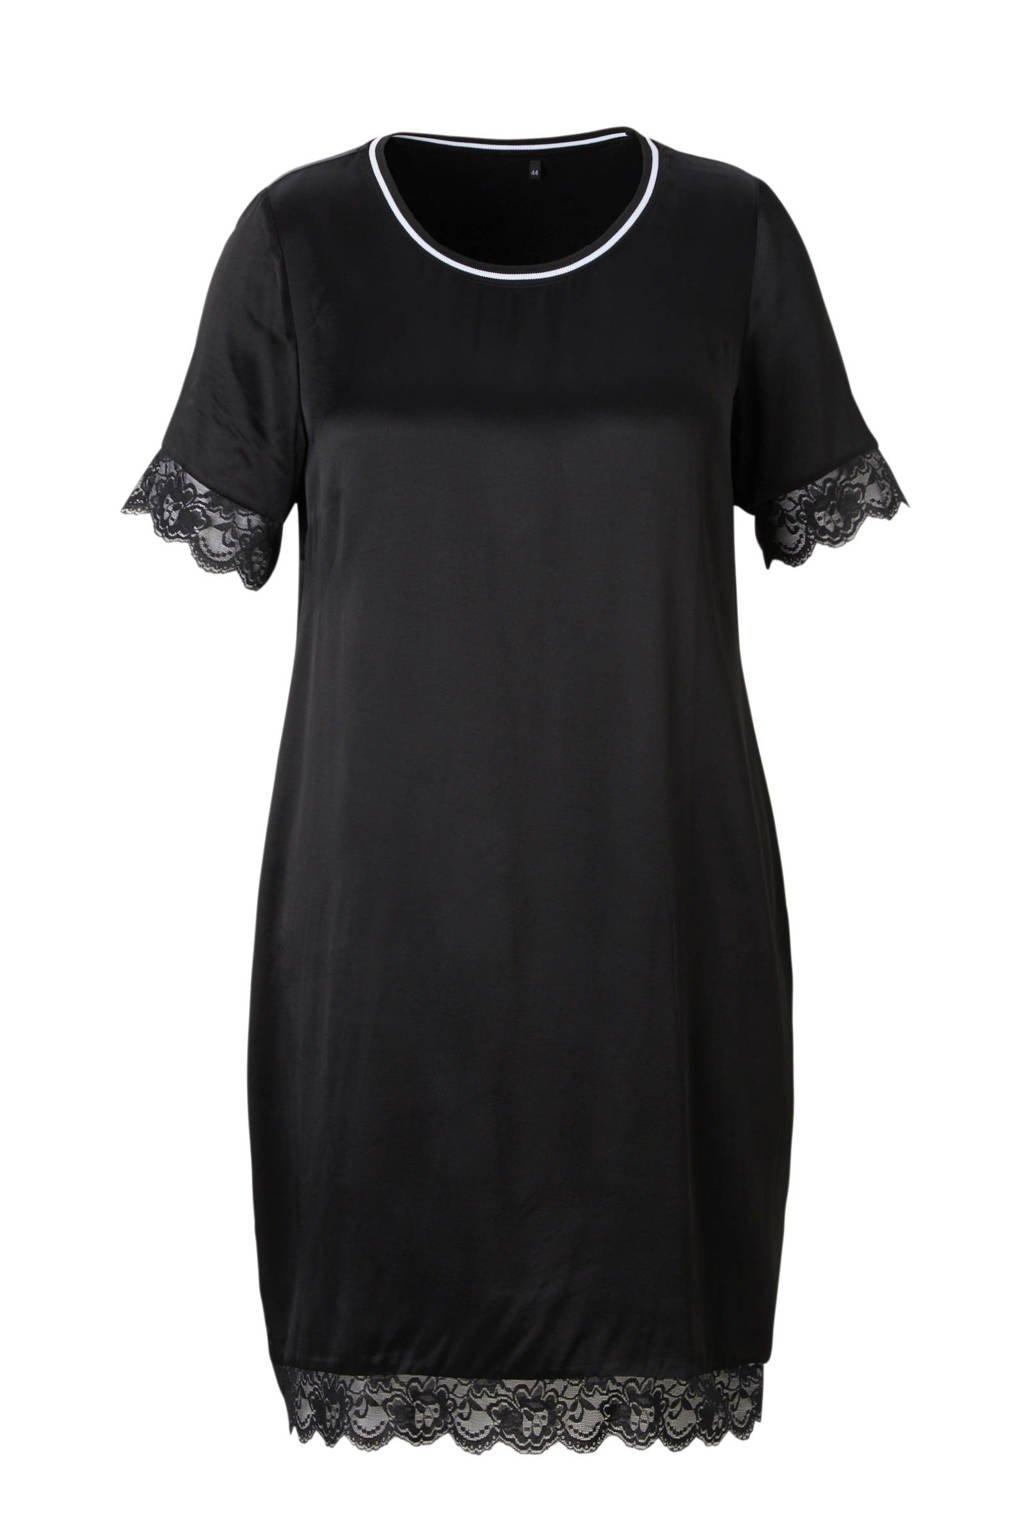 whkmp's great looks jurk met kant, Zwart